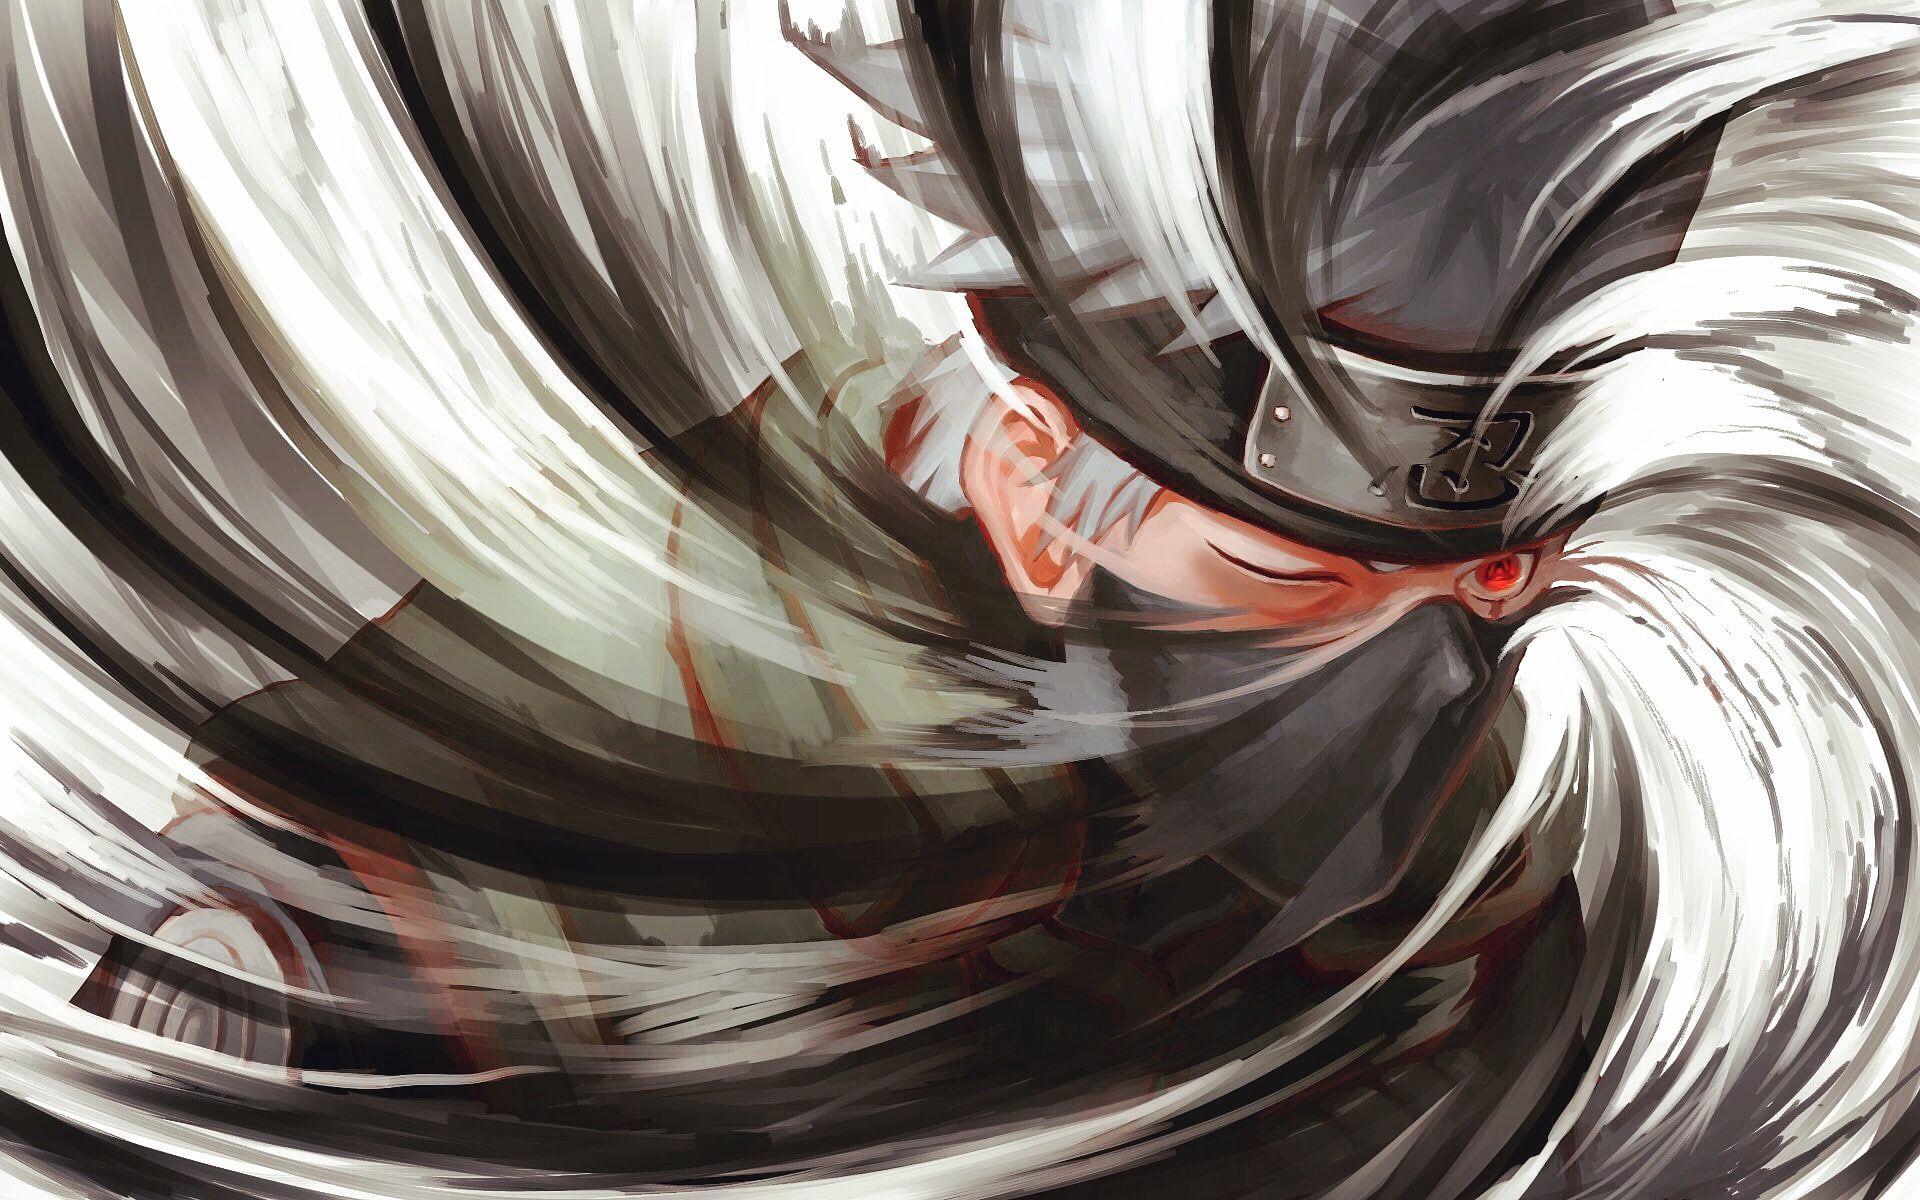 Anime Naruto Kakashi Hatake 1080p Wallpaper Hdwallpaper